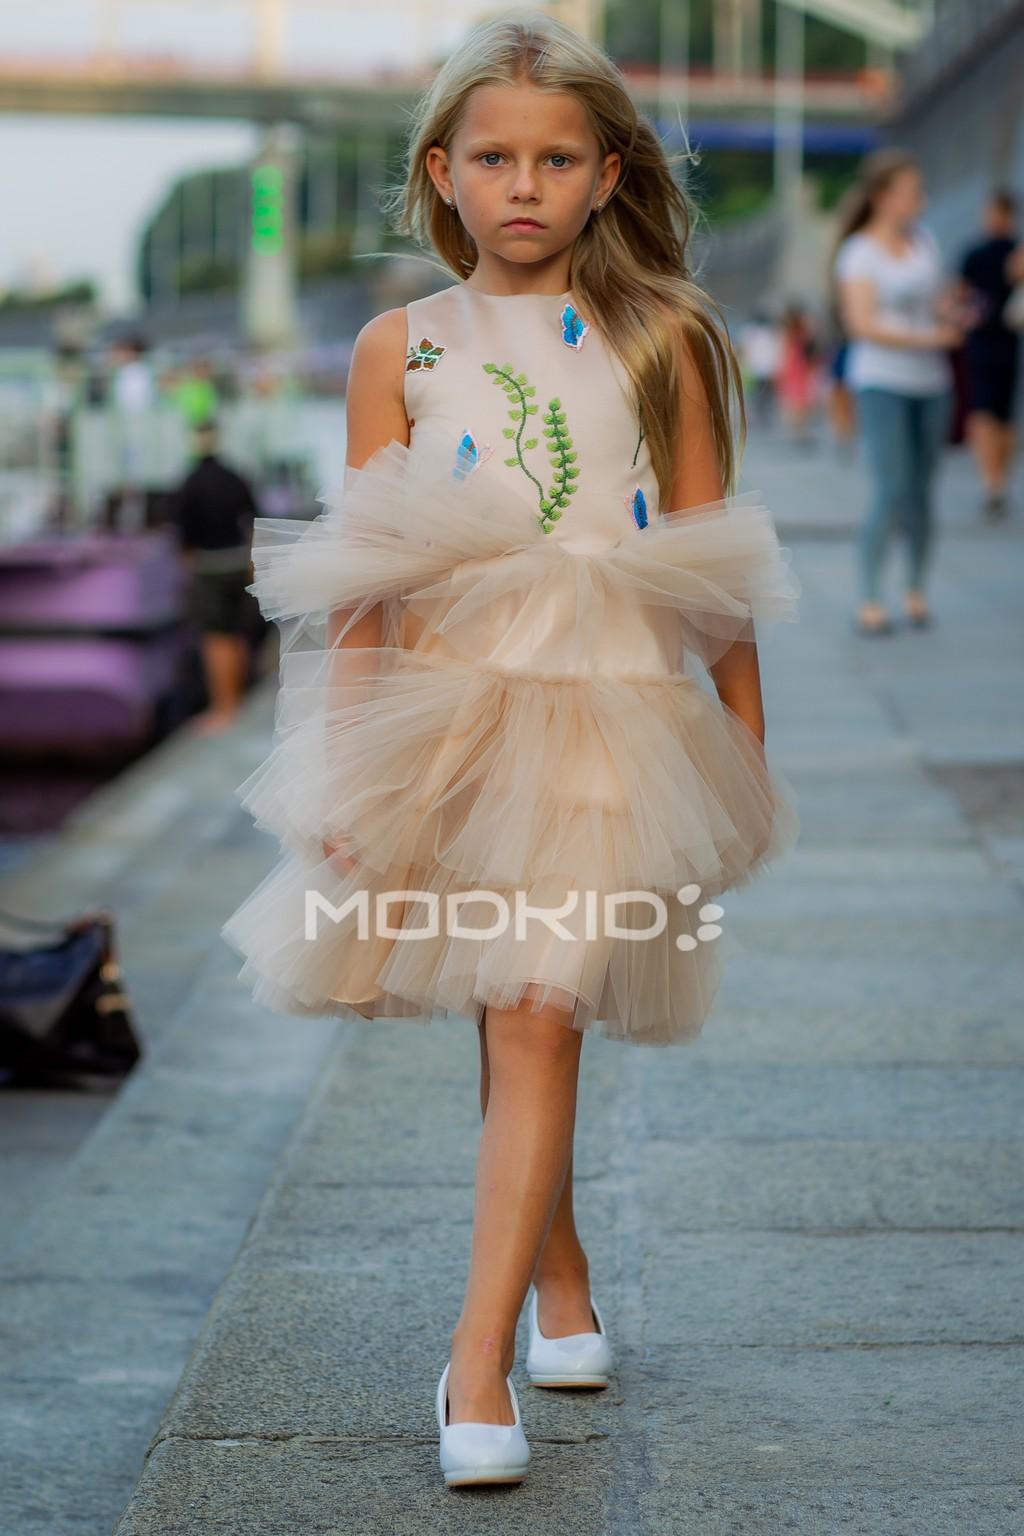 https://modkid.com.ua/images/stories/virtuemart/product/AA2C2089.jpg